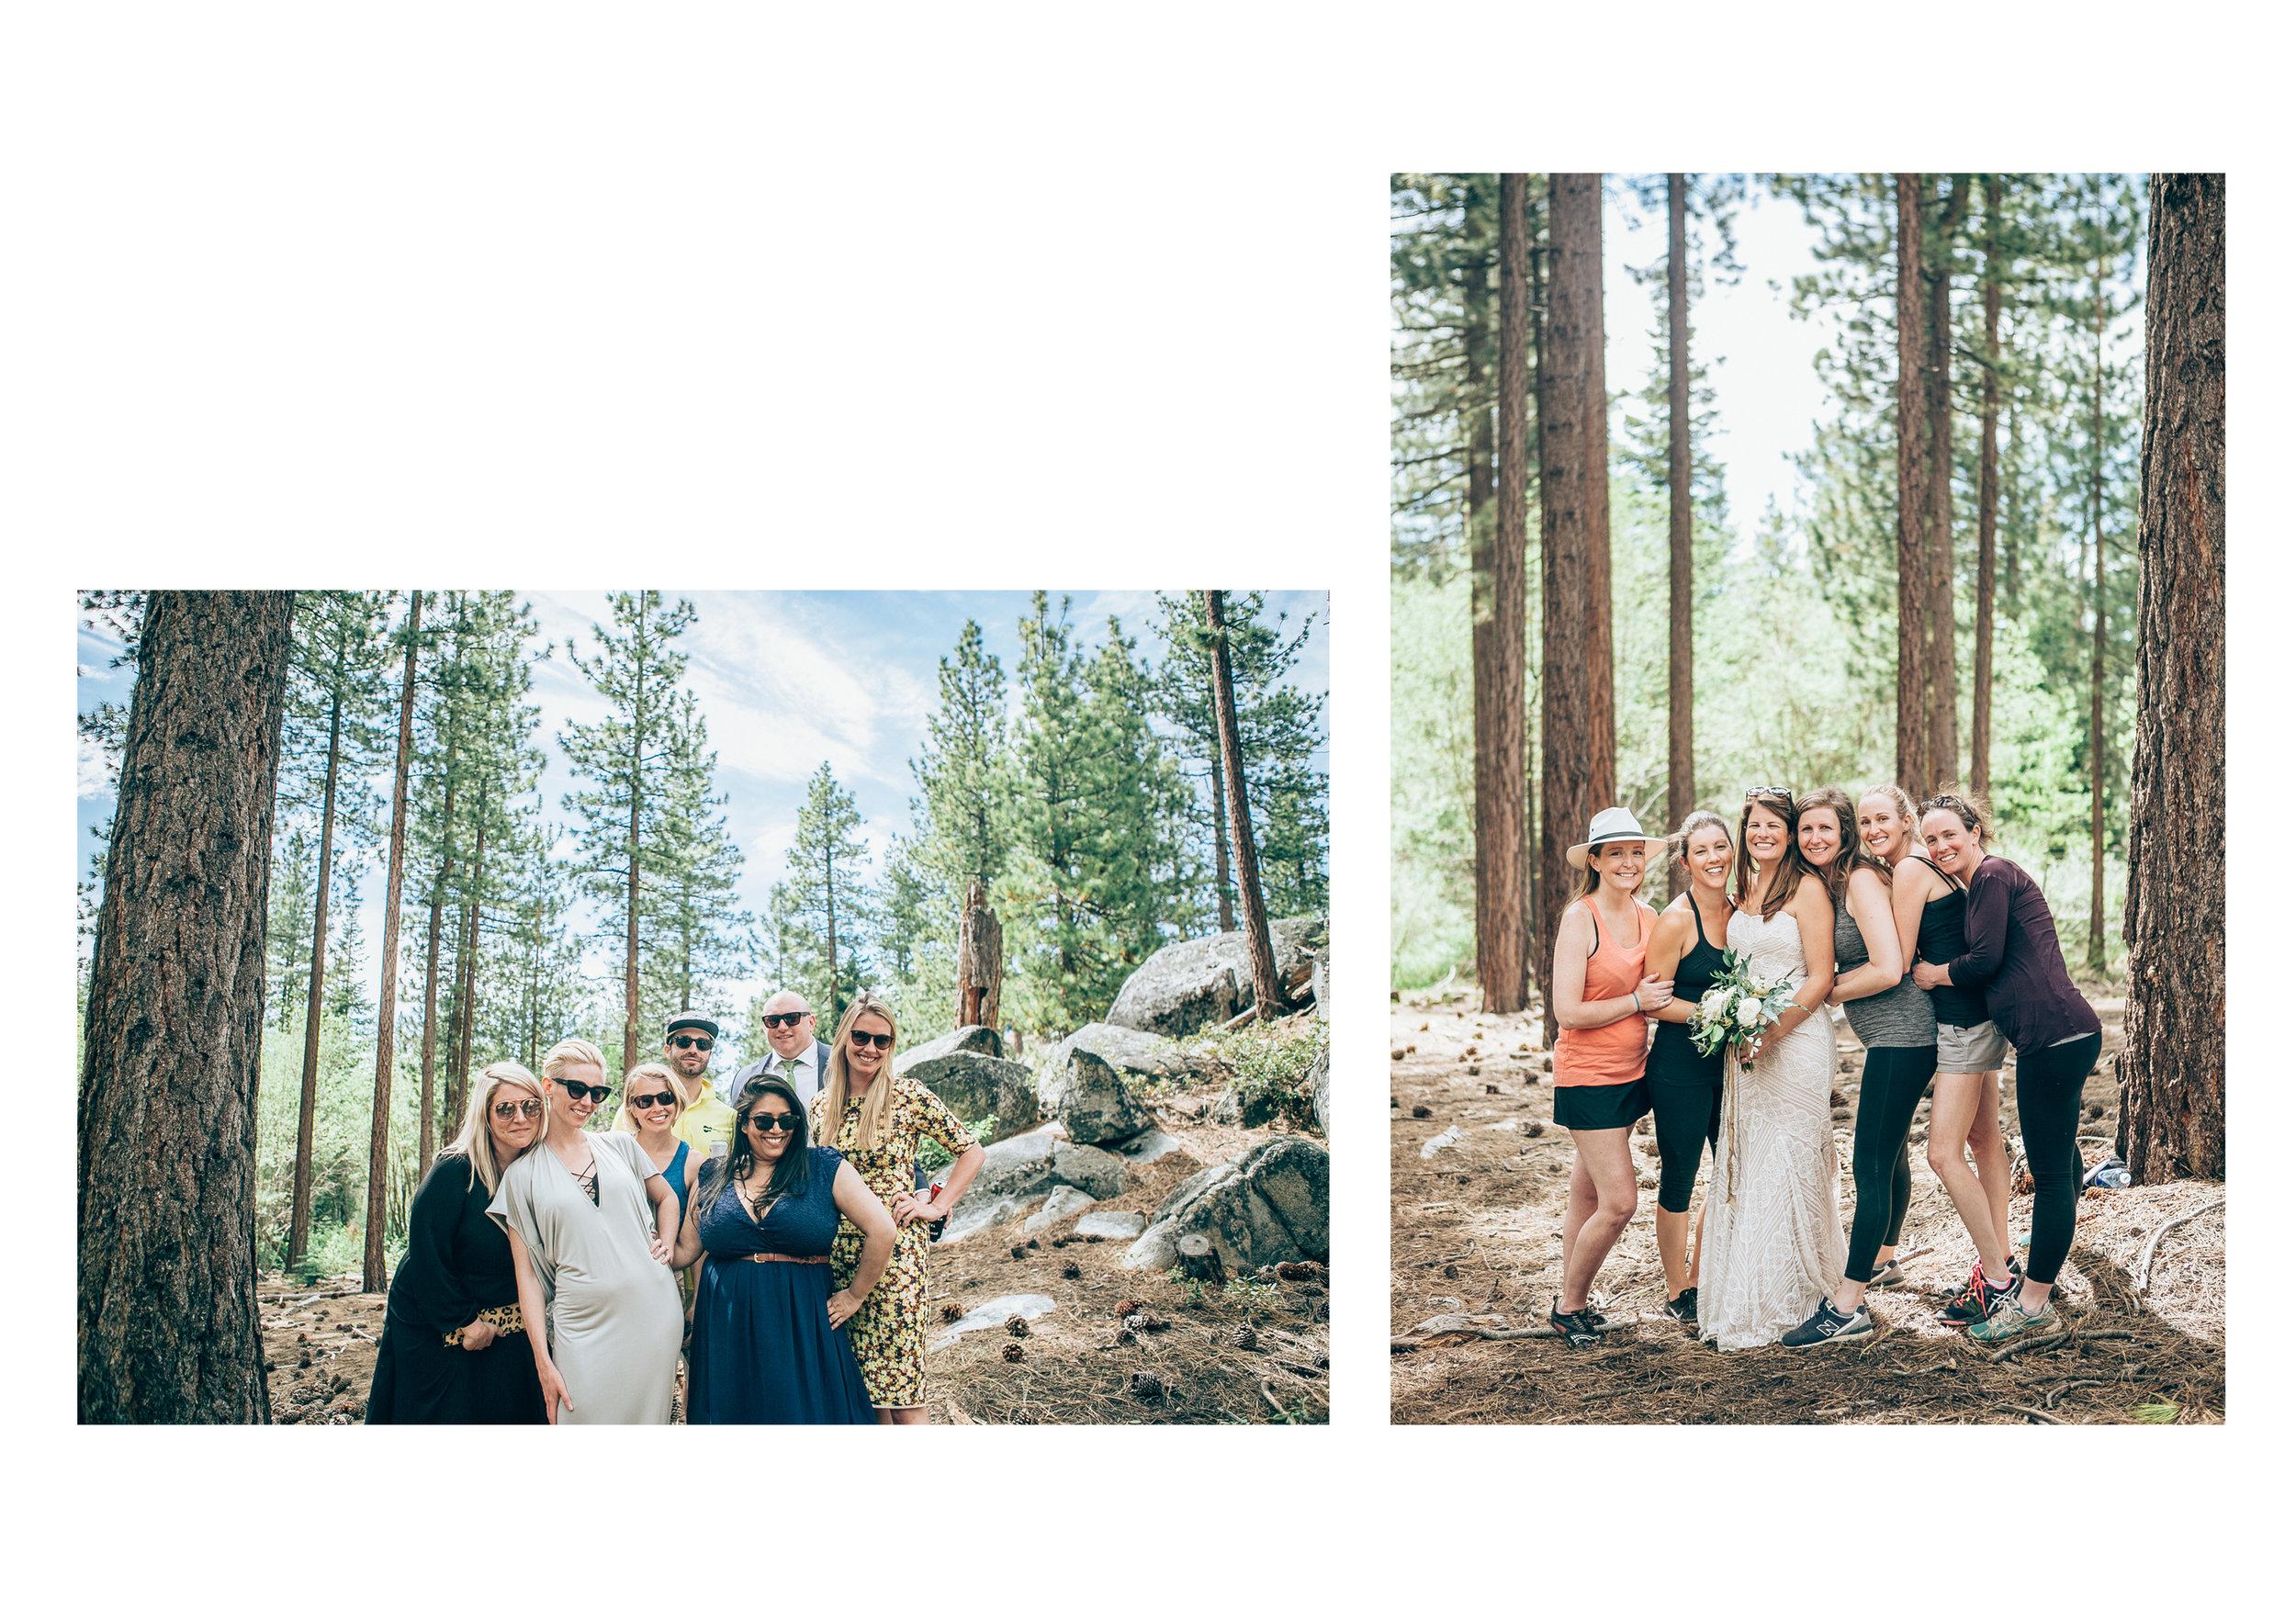 Melisa&David_Wedding_Day_021.jpg